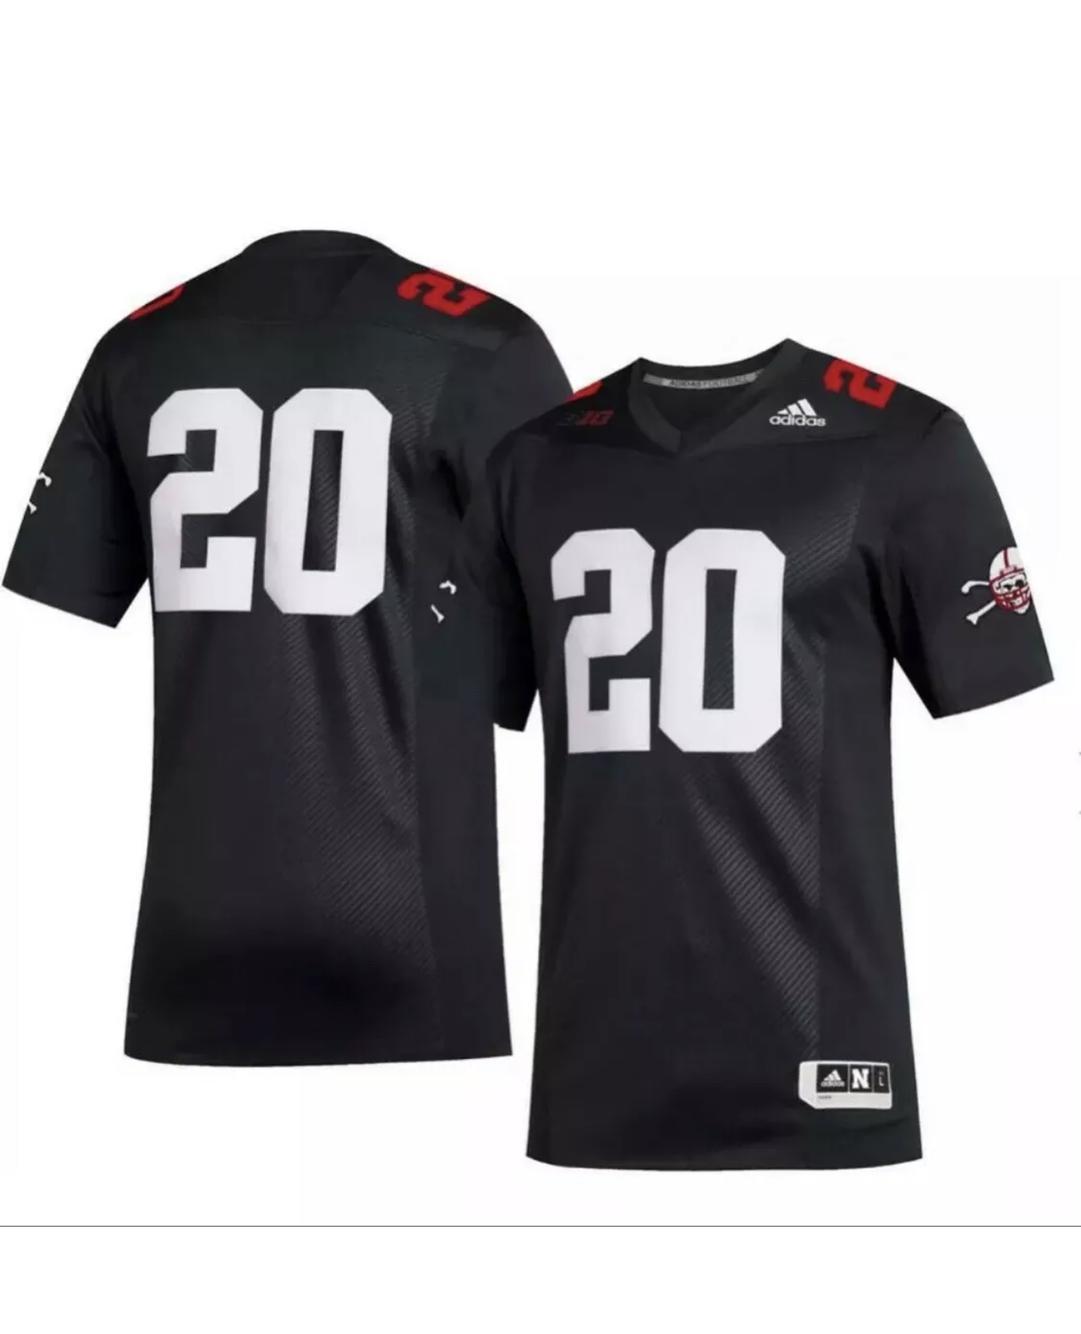 Adidas Nebraska Cornhuskers blackshirts Football Jersey Black ...